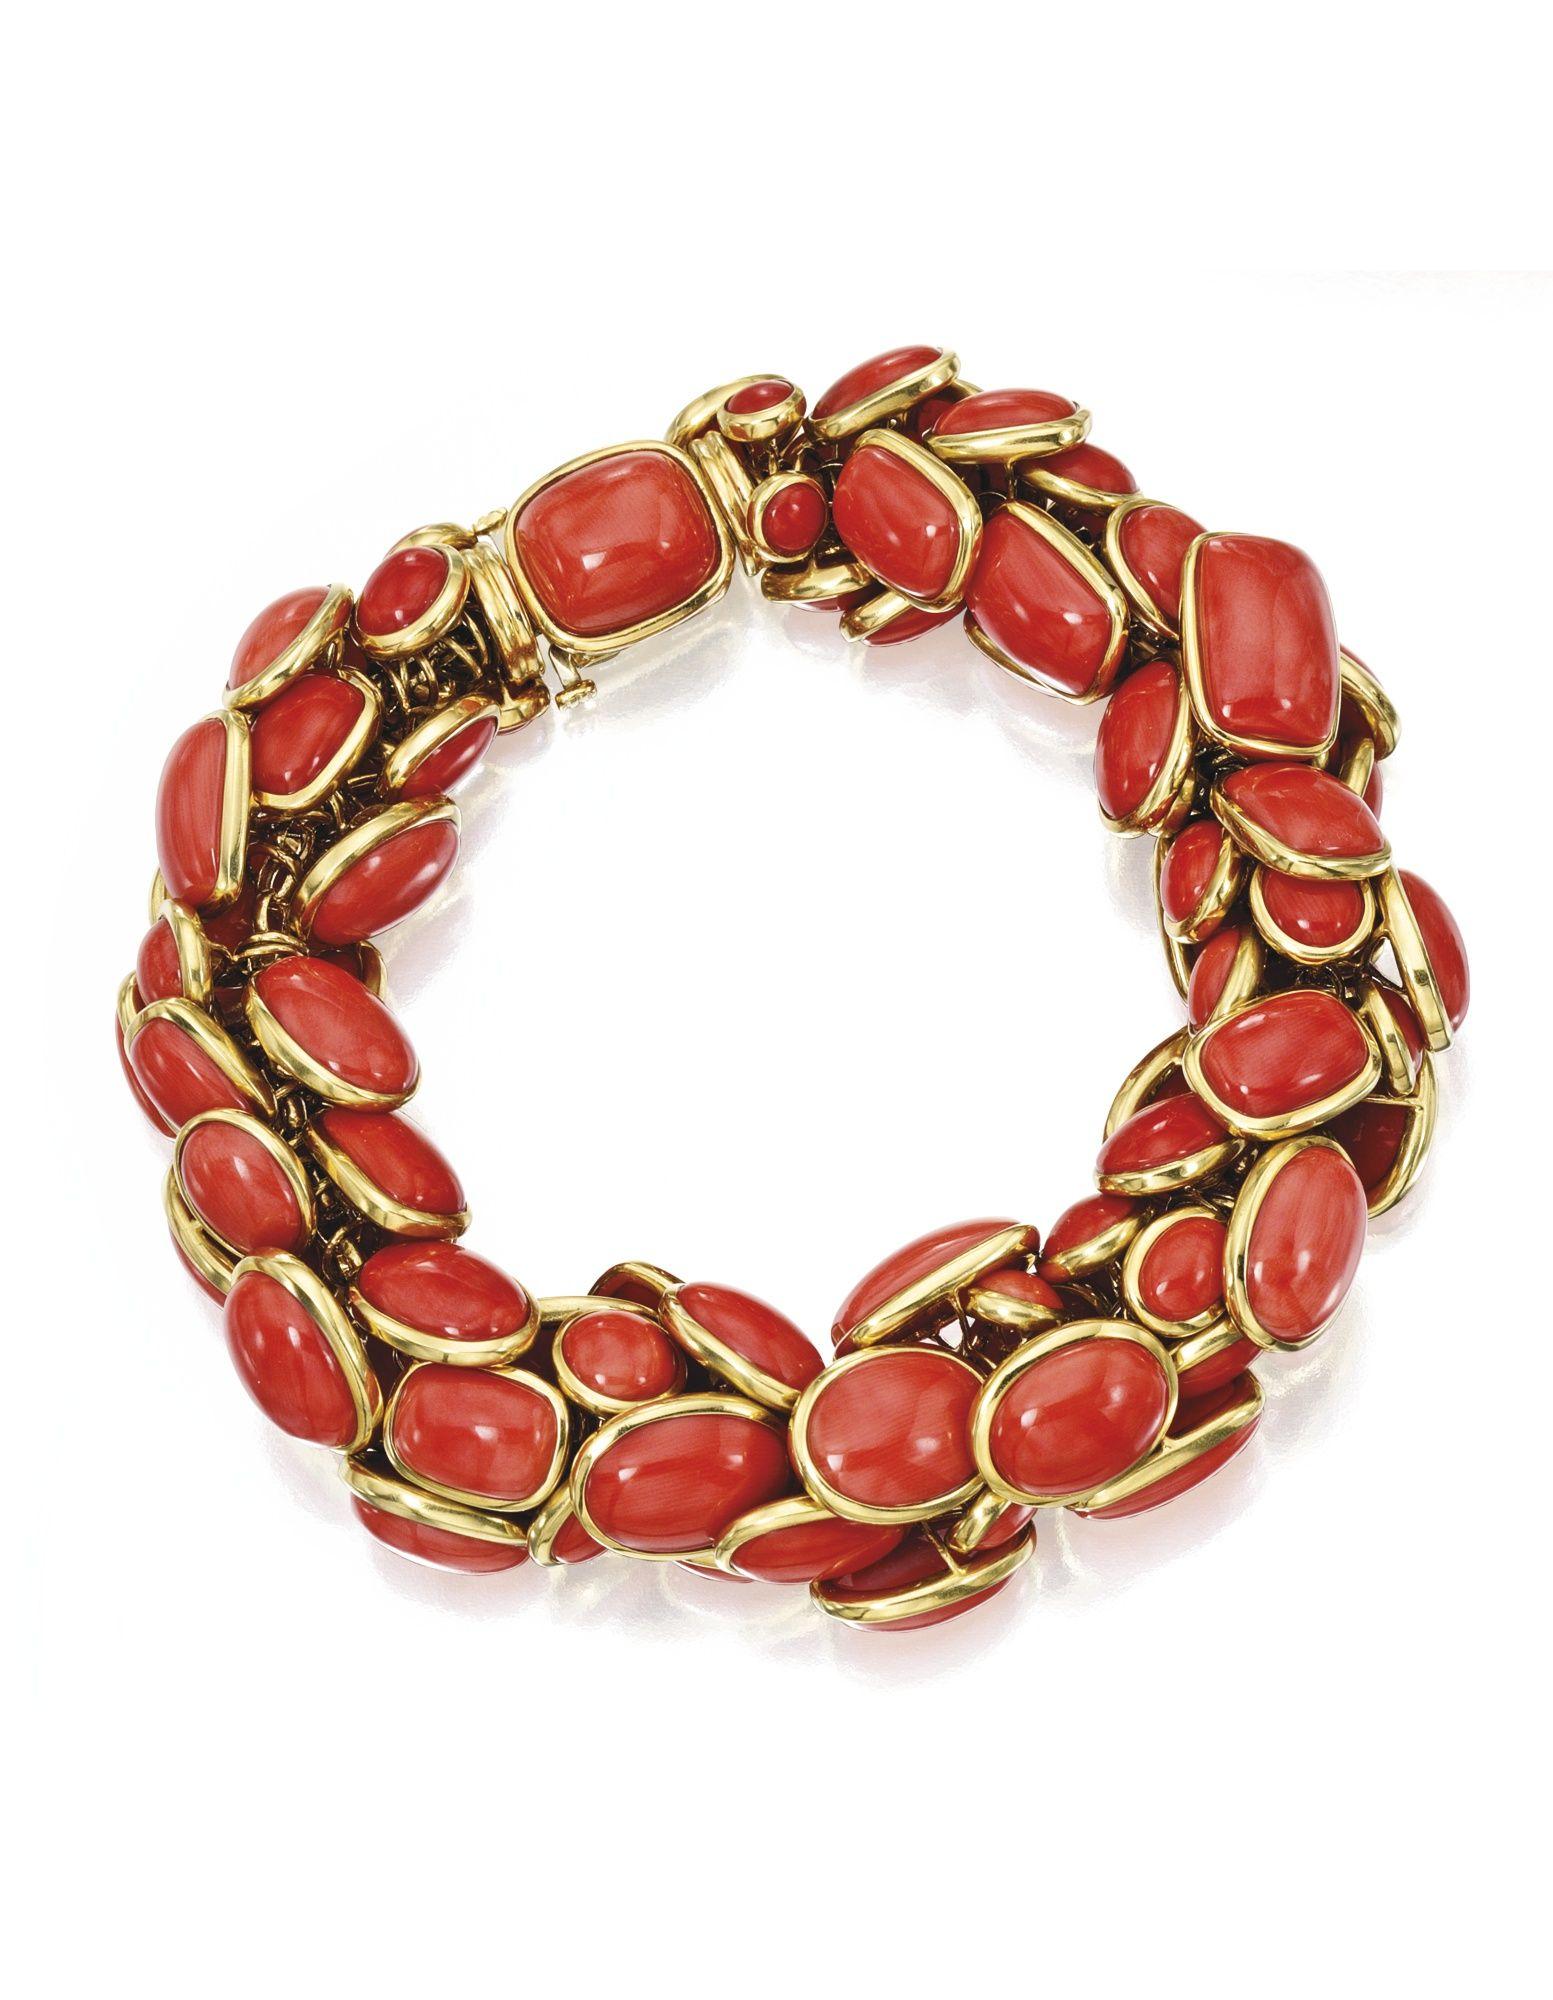 4634c897d648e Sotheby's - 18 Karat Gold and Coral Bracelet, Seaman Schepps ...